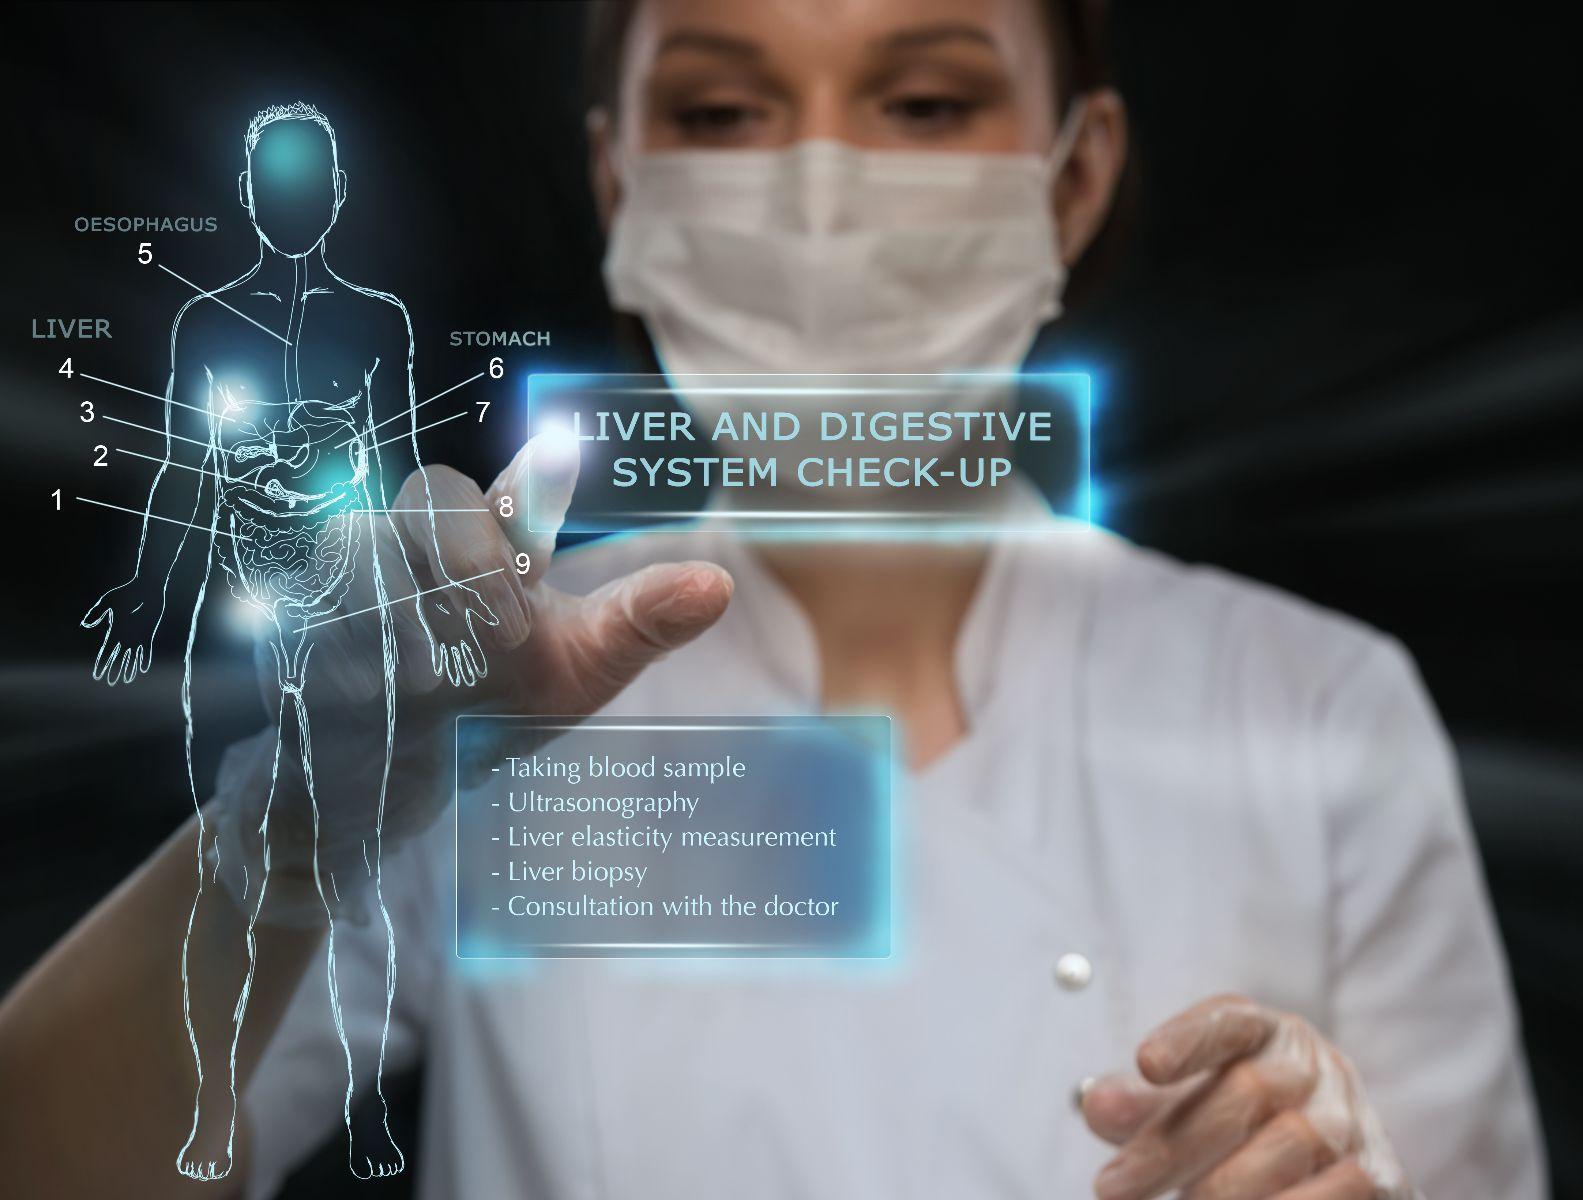 Doctora revisando pantalla con datos de un paciente